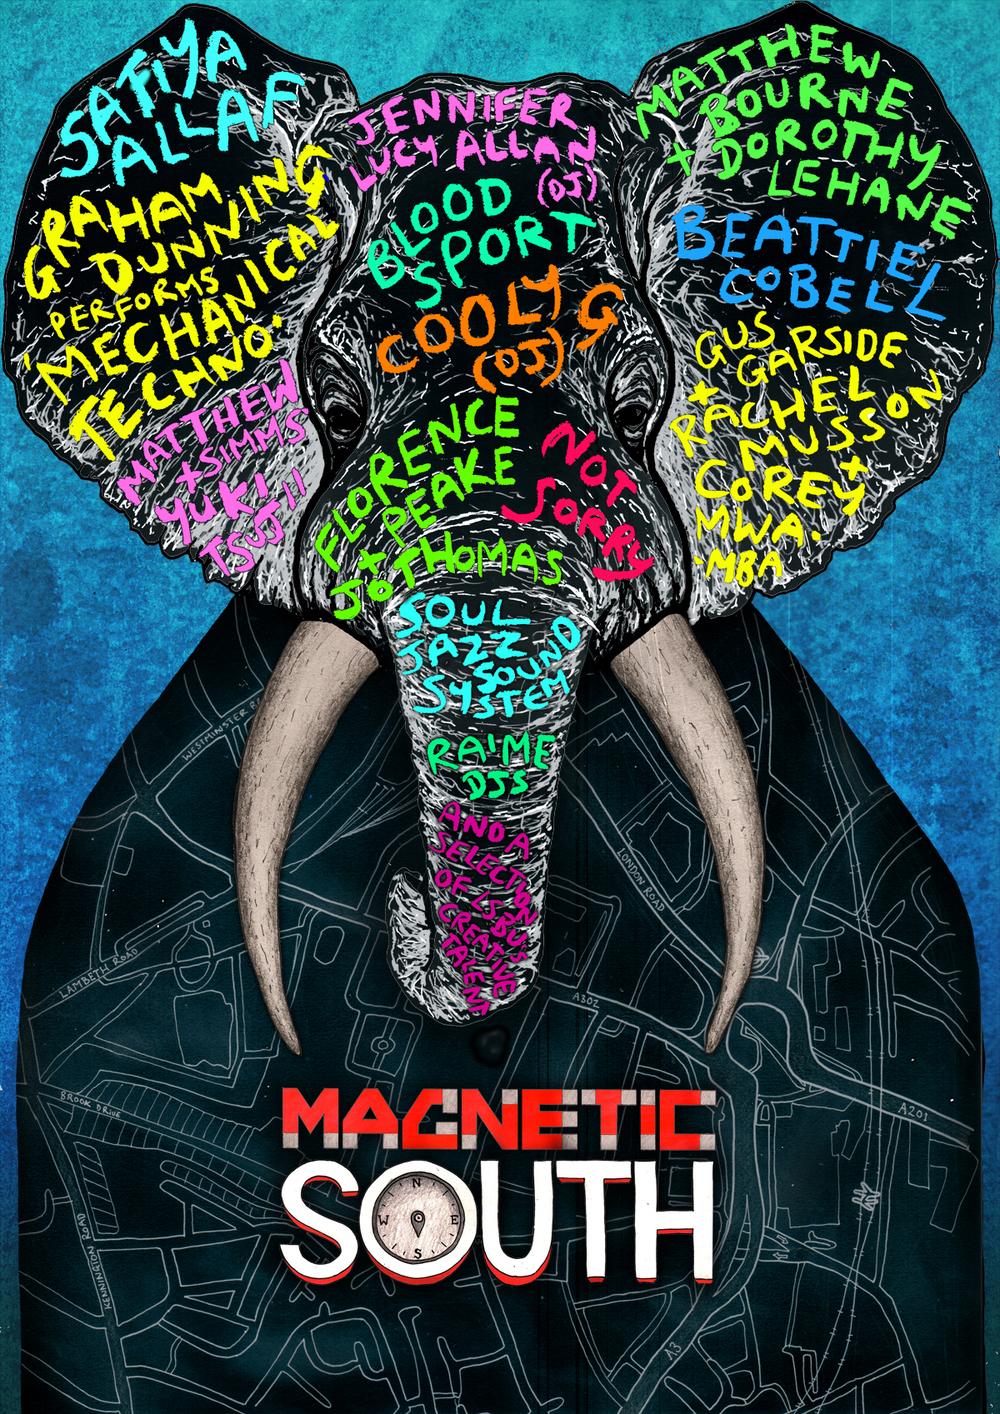 Poster design for Magnetic South Festival. February 2016.